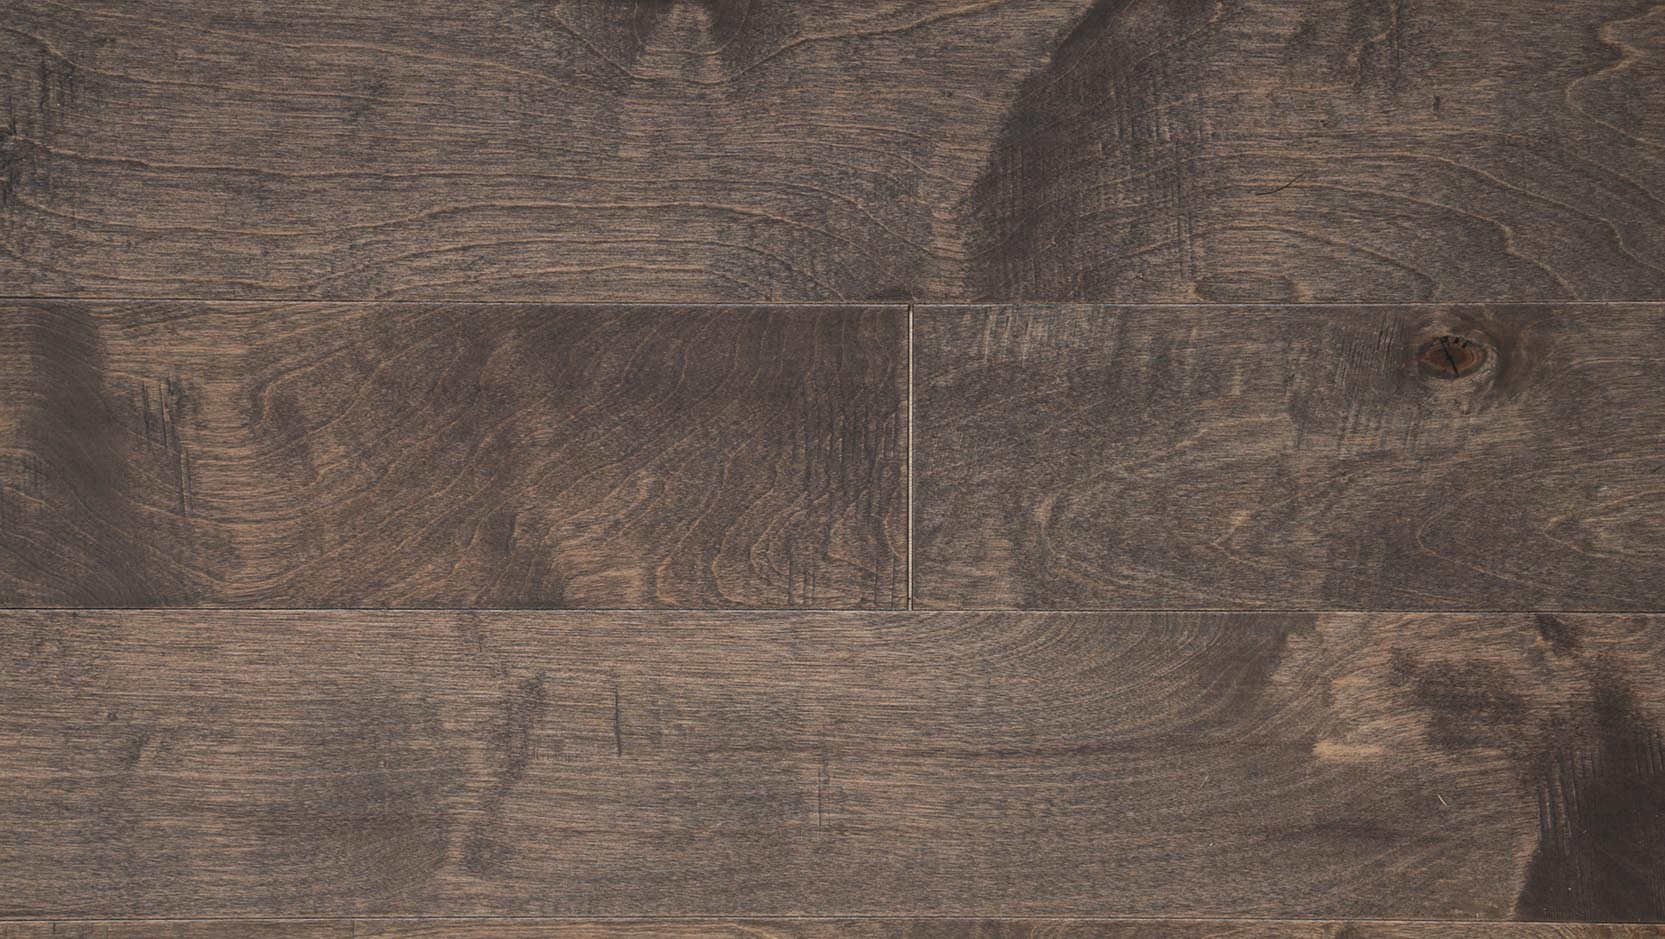 28 Elegant 6 Engineered Hardwood Flooring 2021 free download 6 engineered hardwood flooring of hardwood flooring for specifications